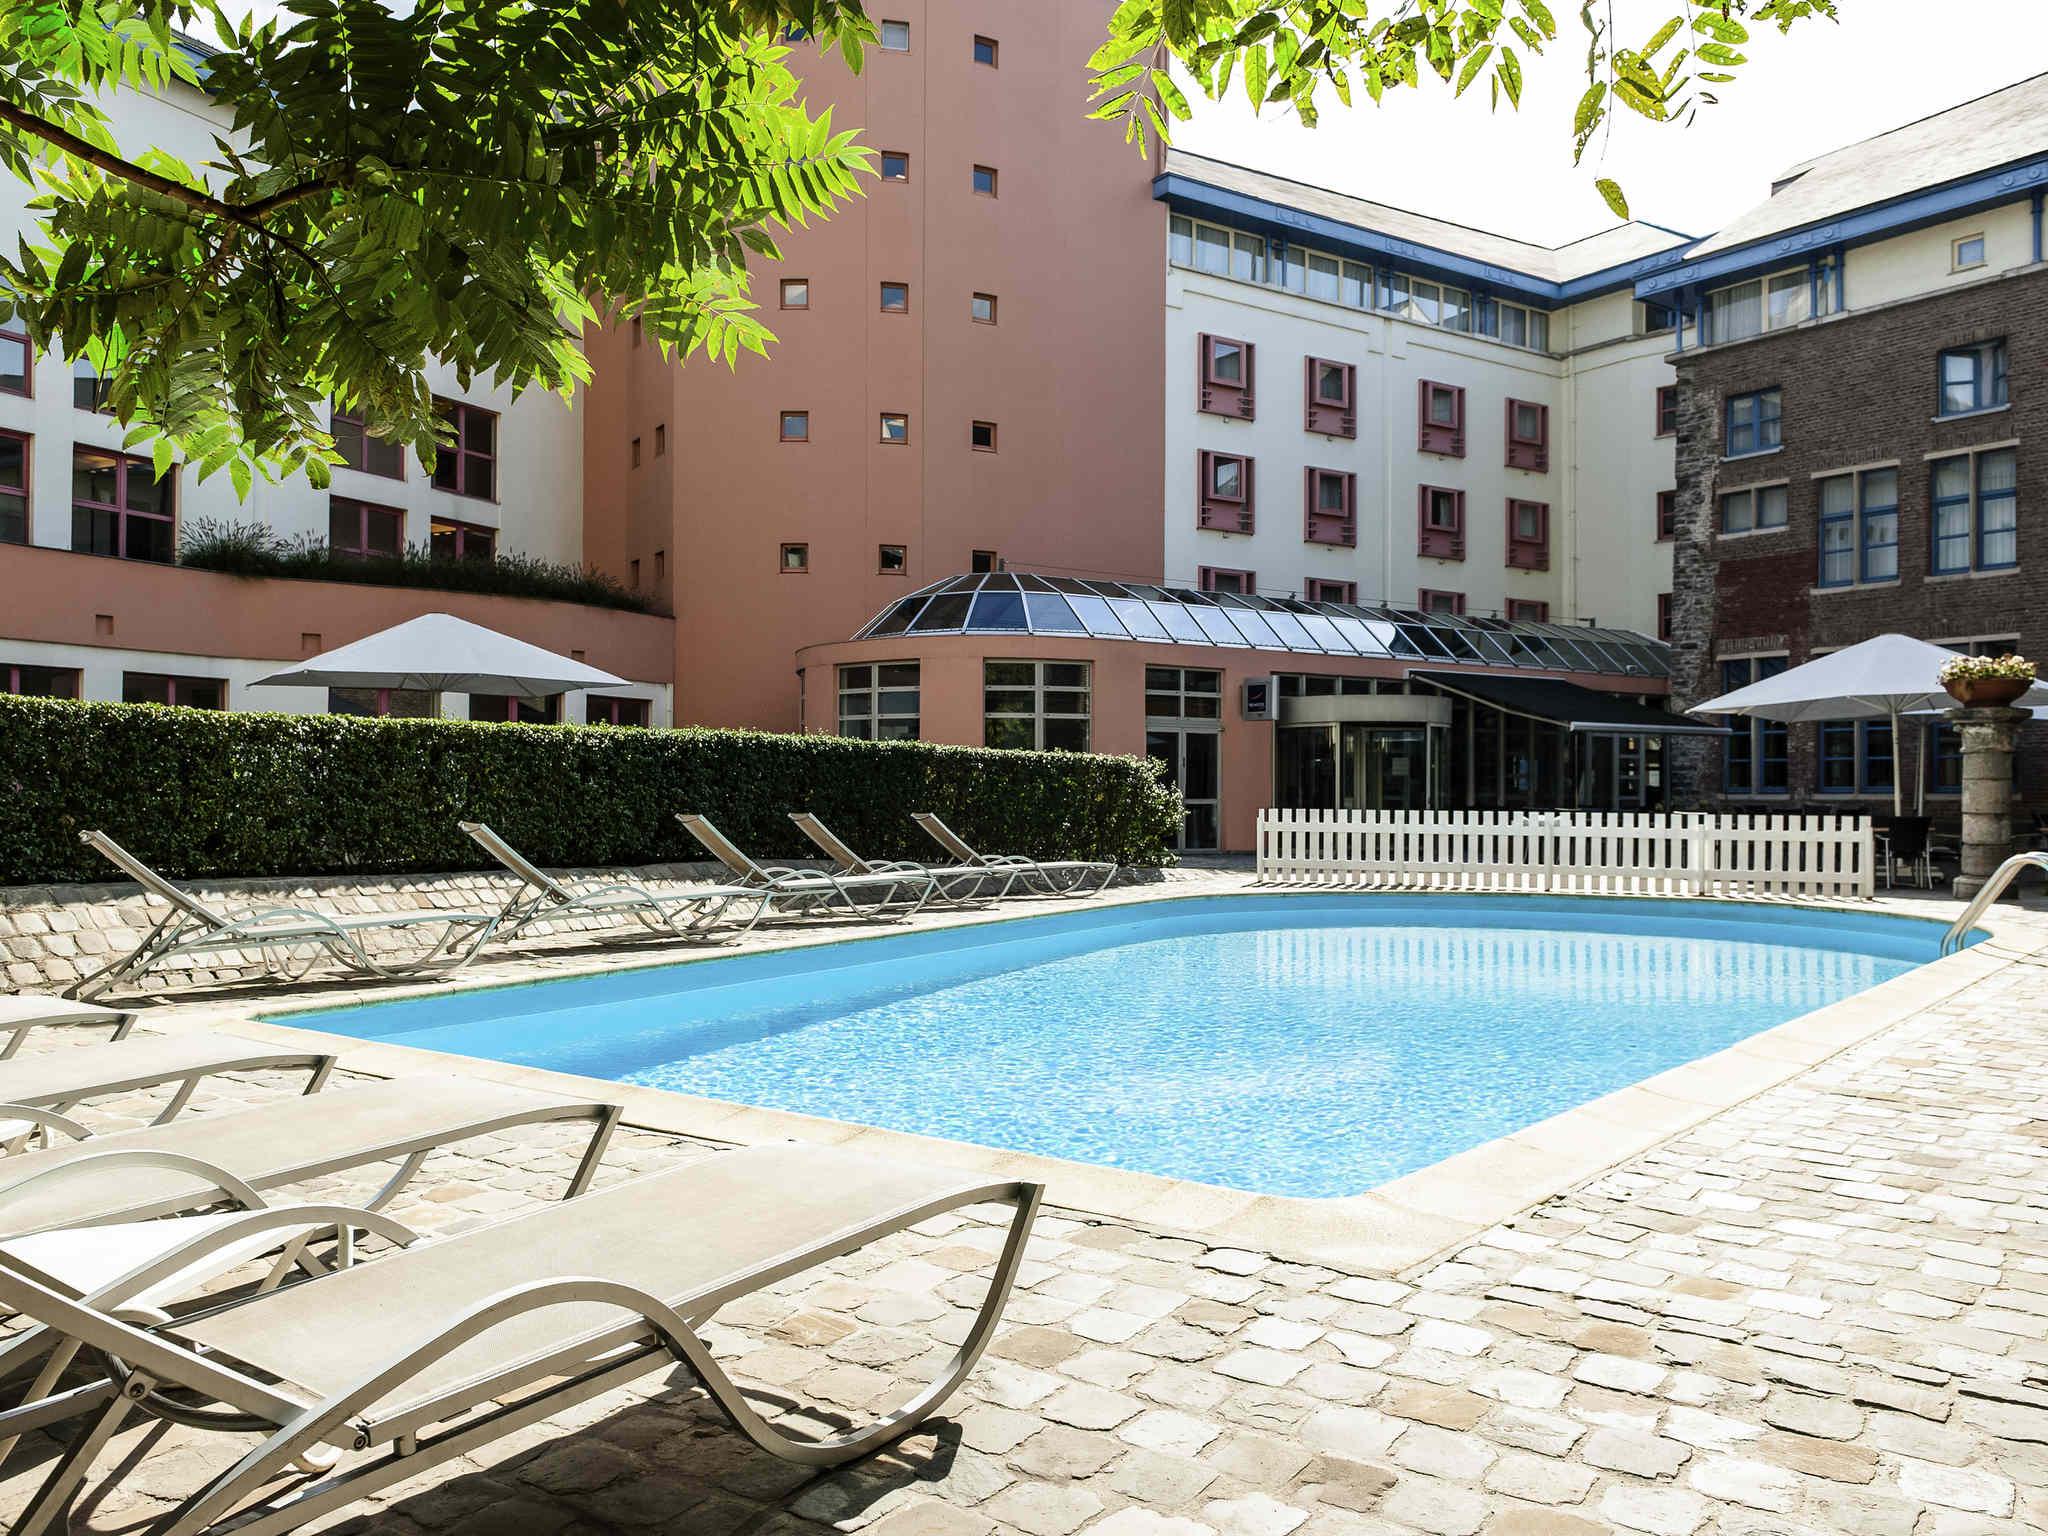 Hotel - Novotel Gent Centrum